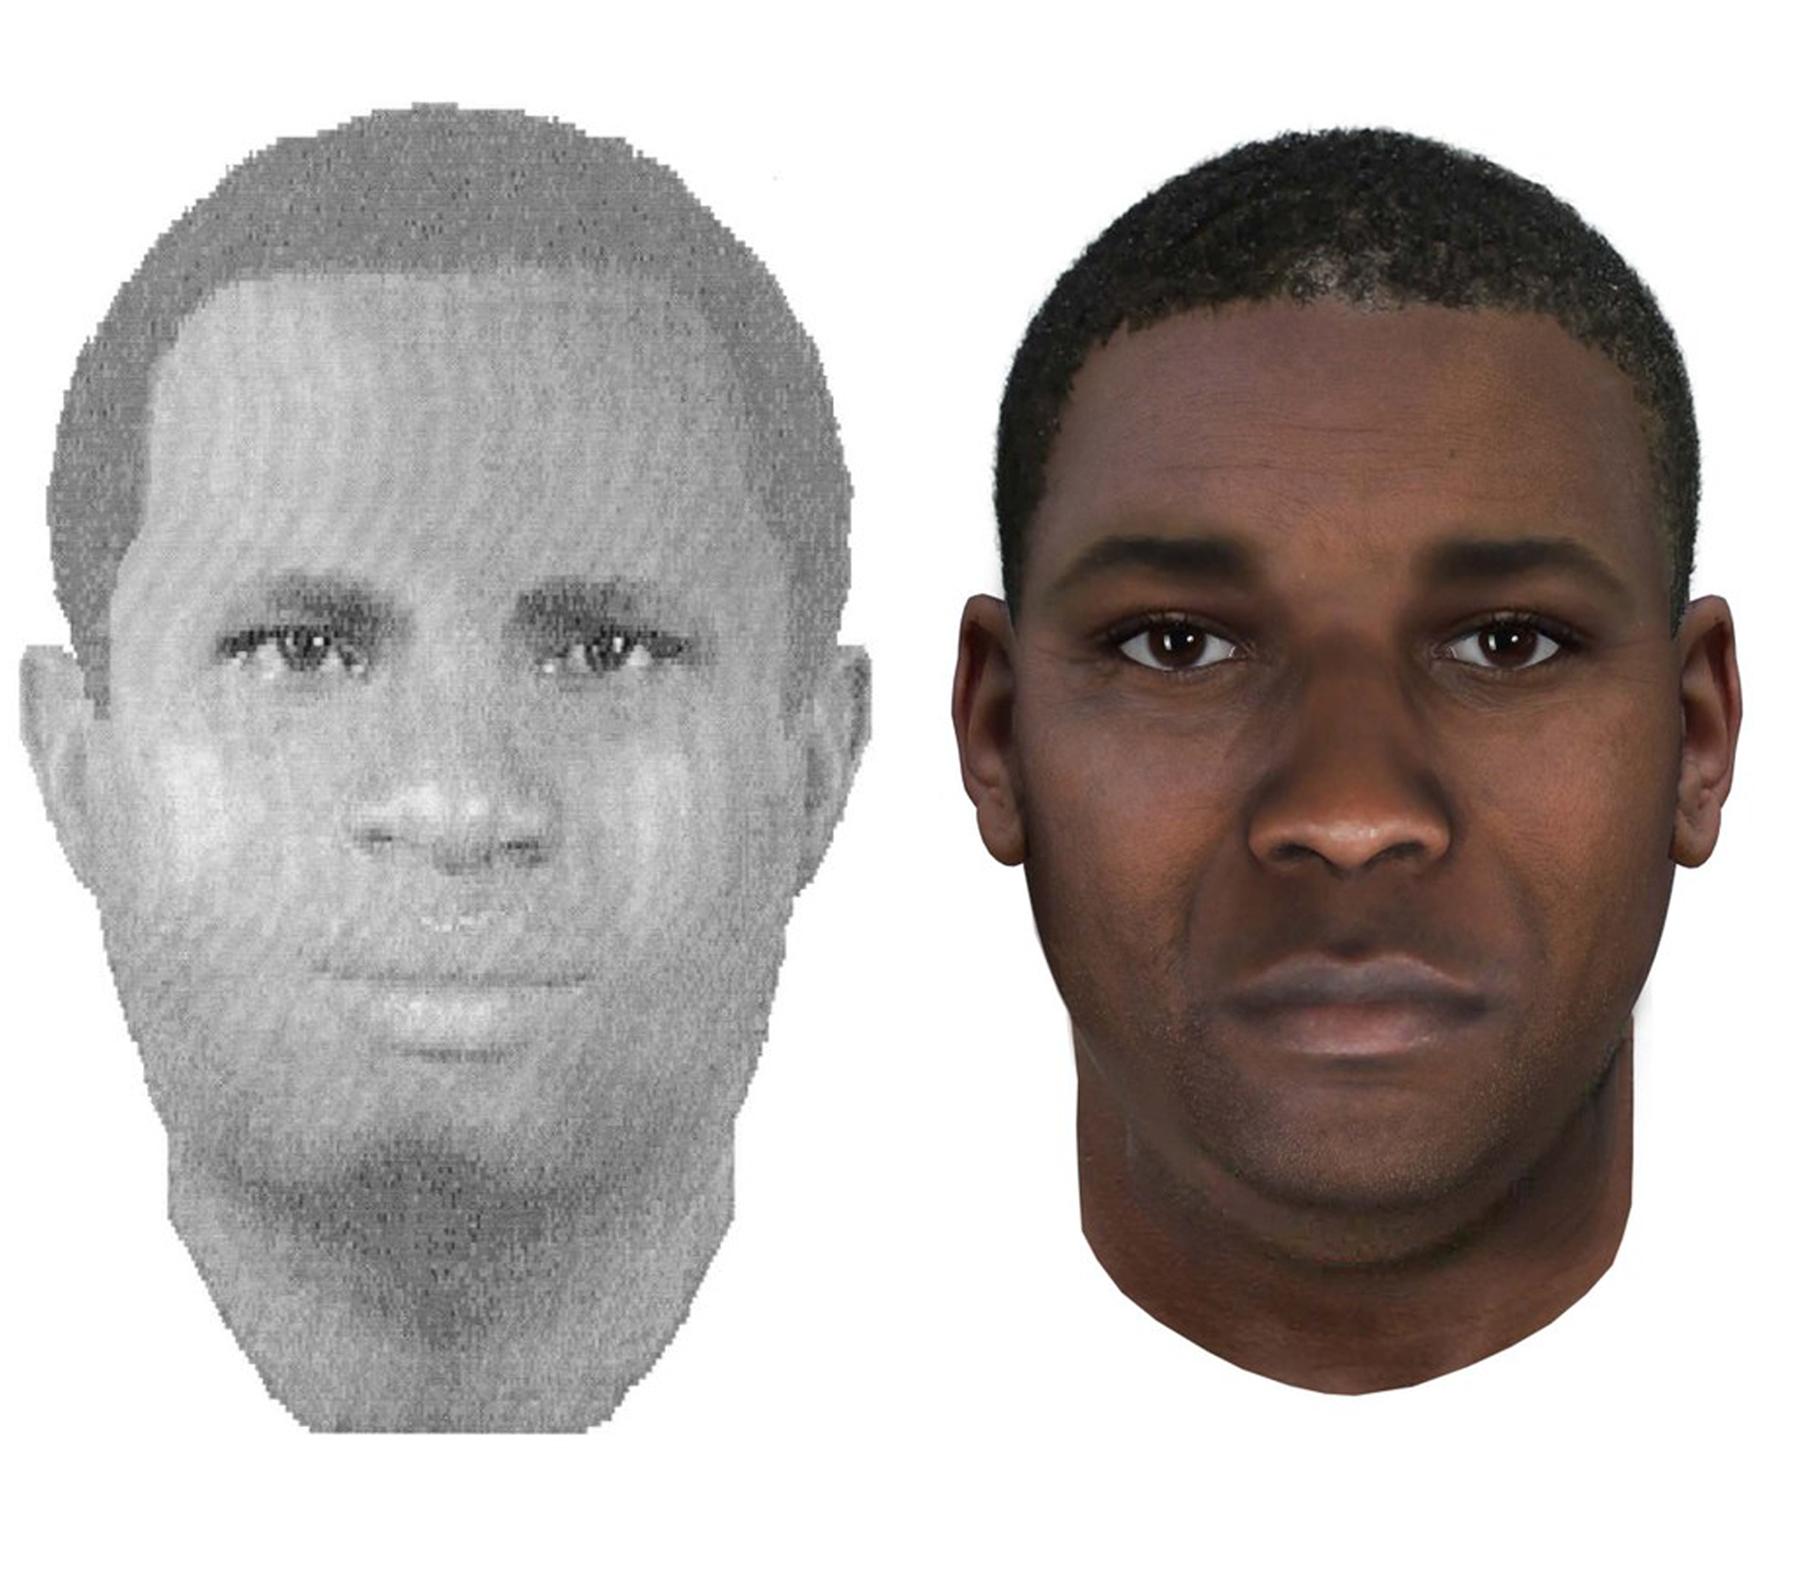 D.C. hotel serial rapist indicted via DNA, but suspect remains elusive